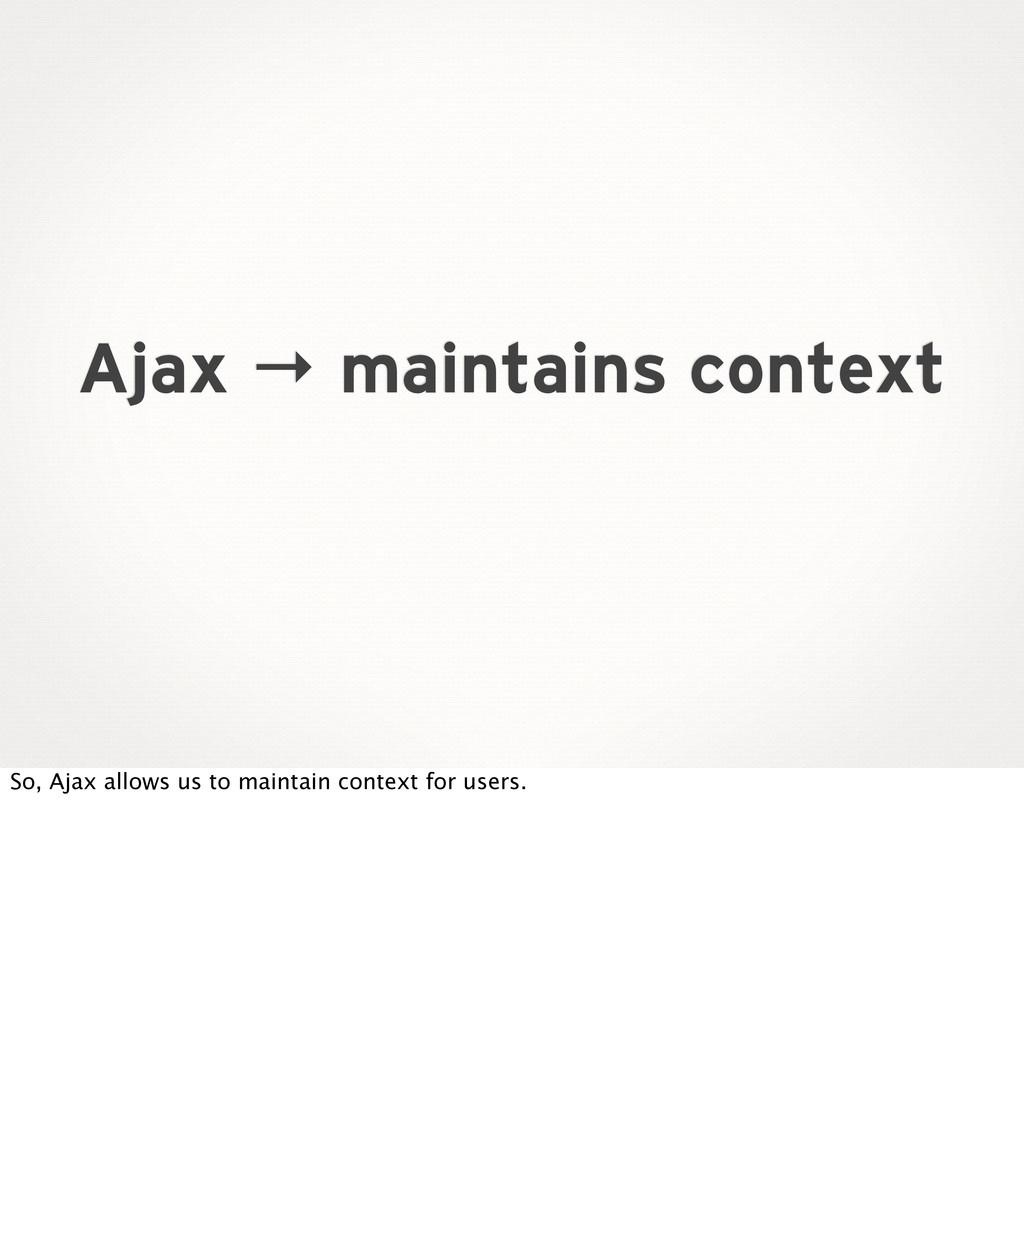 Ajax → maintains context So, Ajax allows us to ...